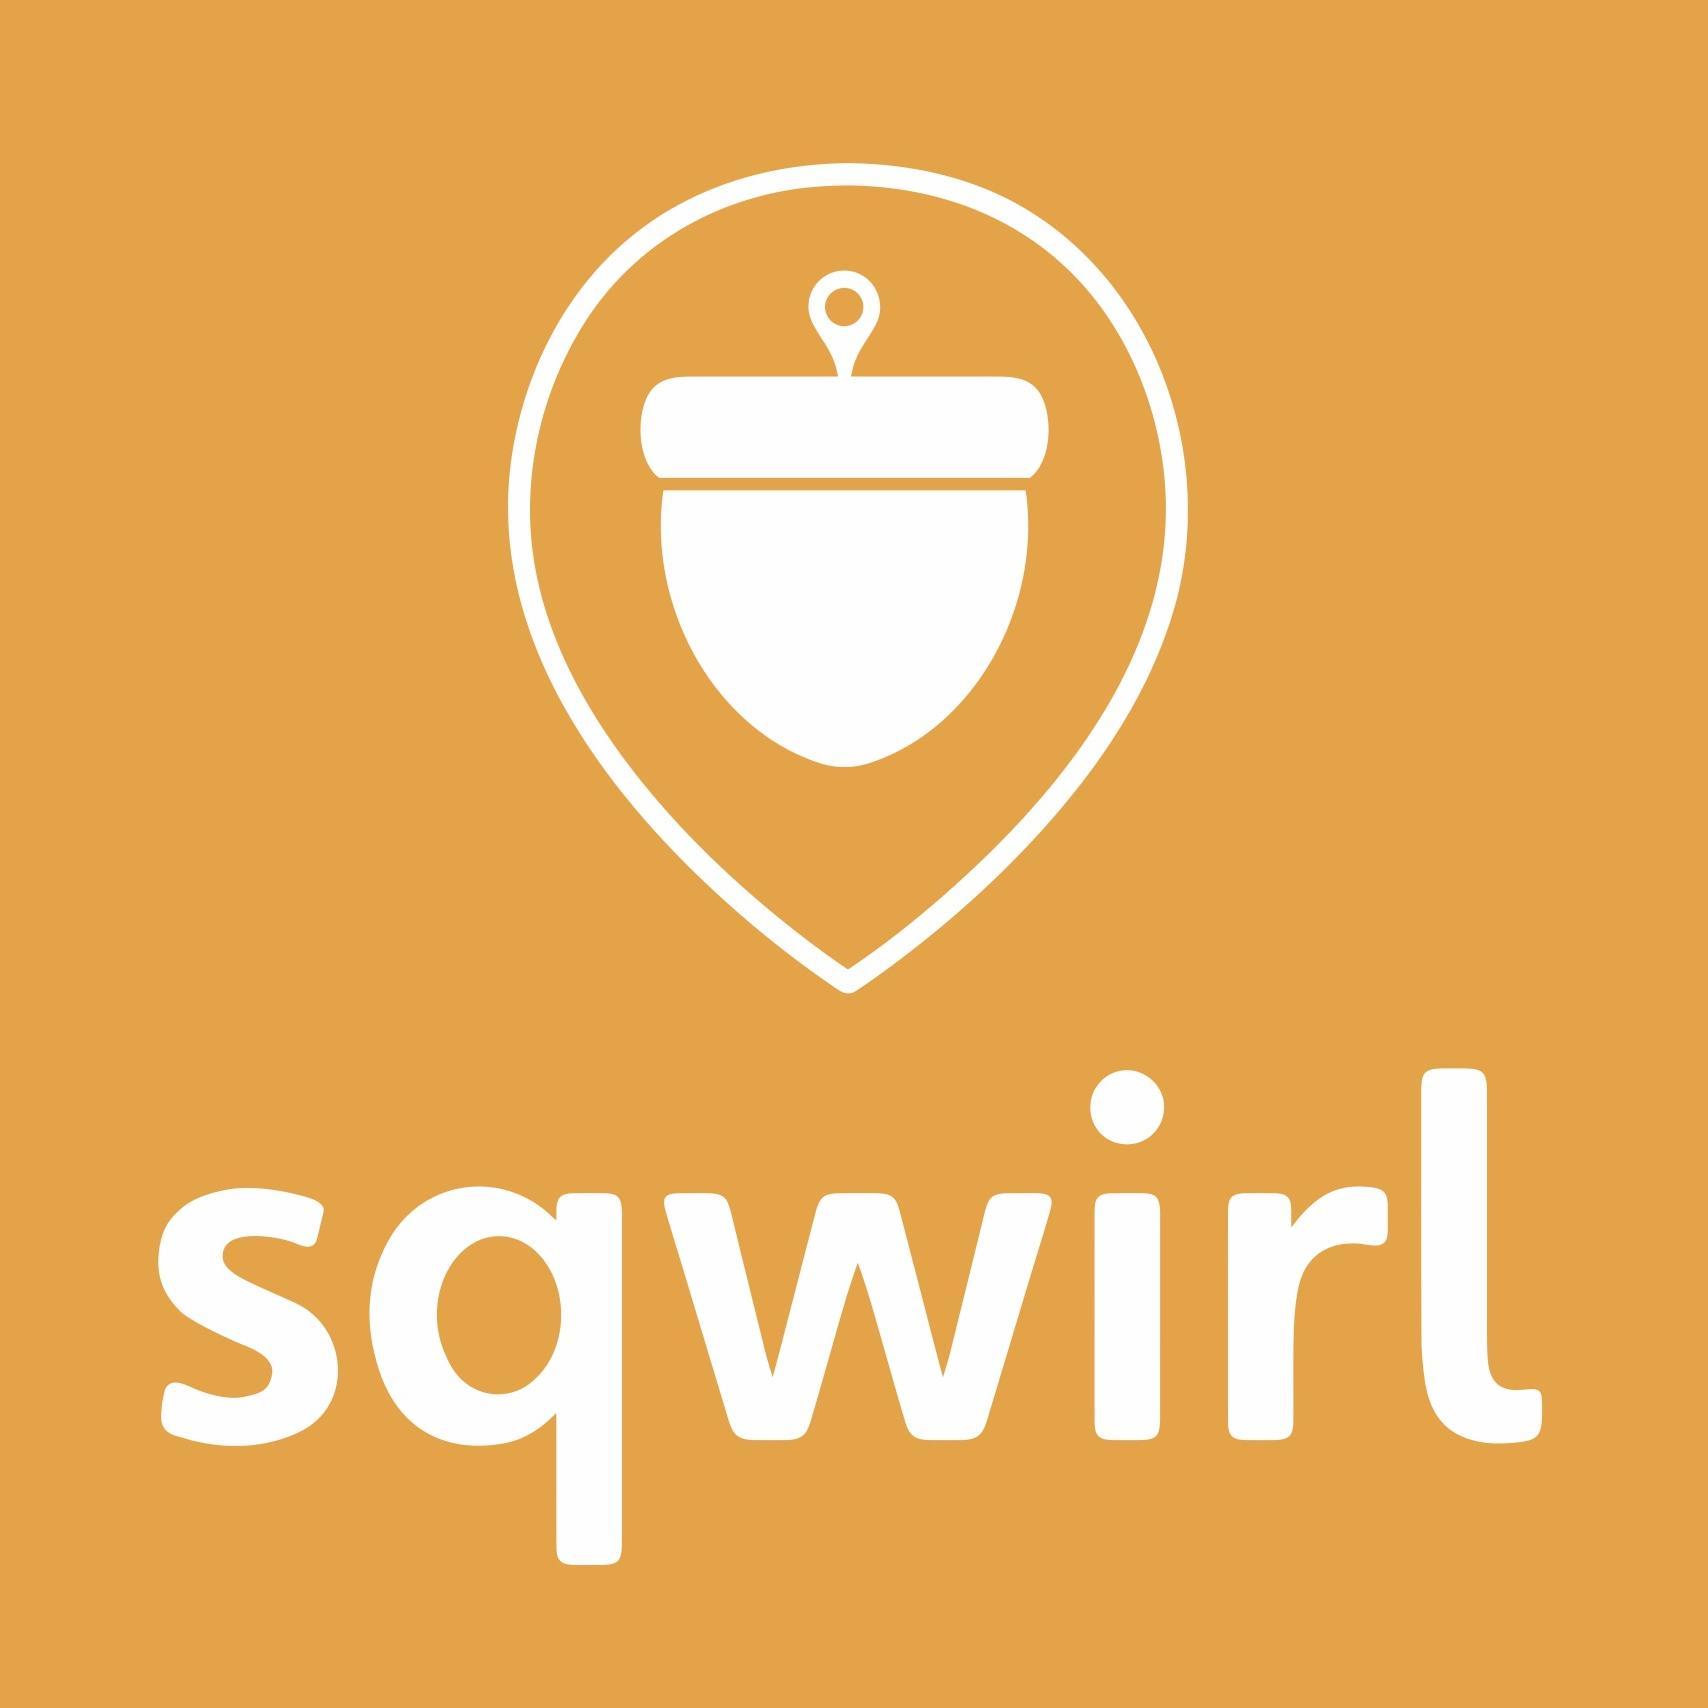 Sqwirl logo